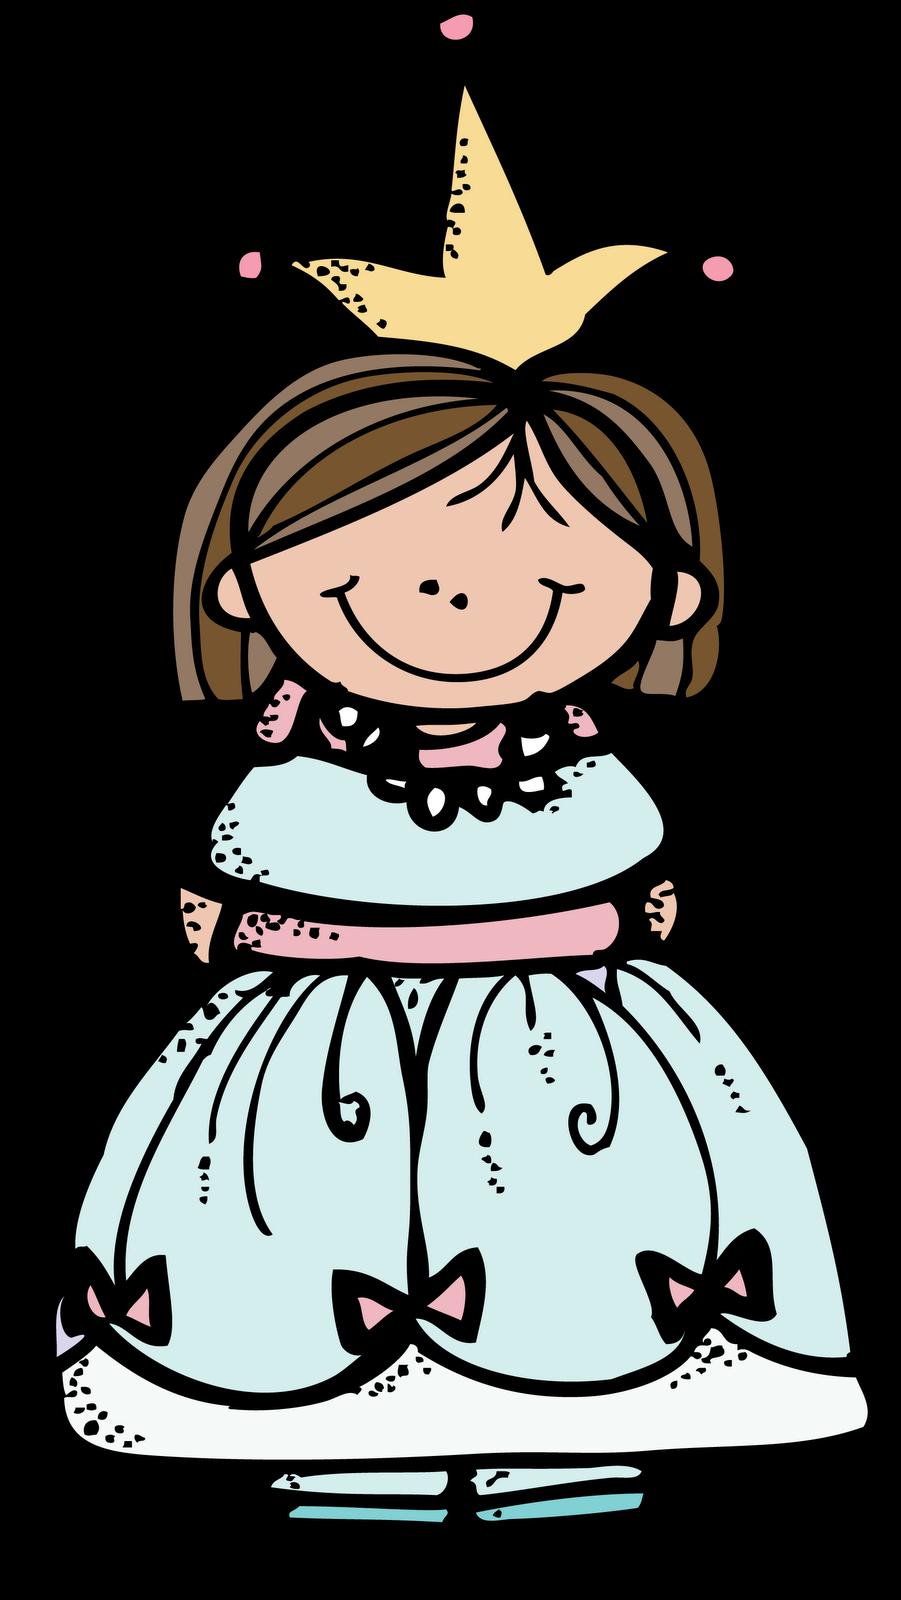 Queen clipart melonheadz Princess April's April's :) MelonHeadz: